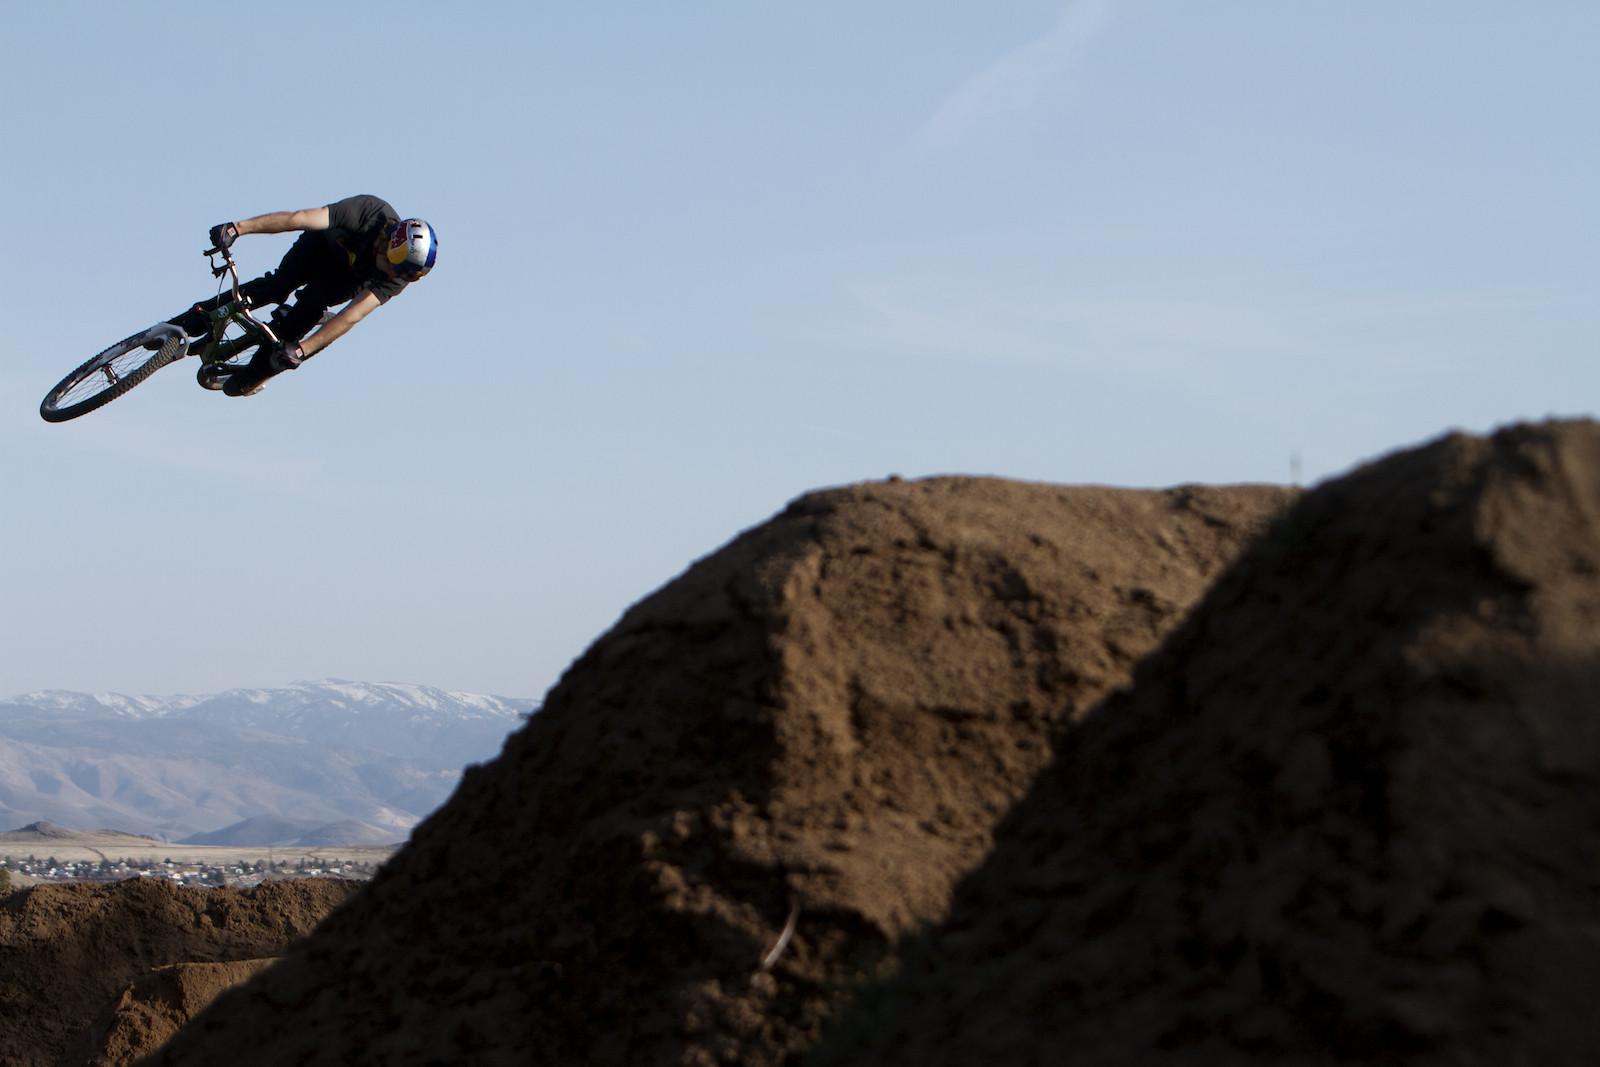 bass_three_reno_Tepper - corytepper.com - Mountain Biking Pictures - Vital MTB